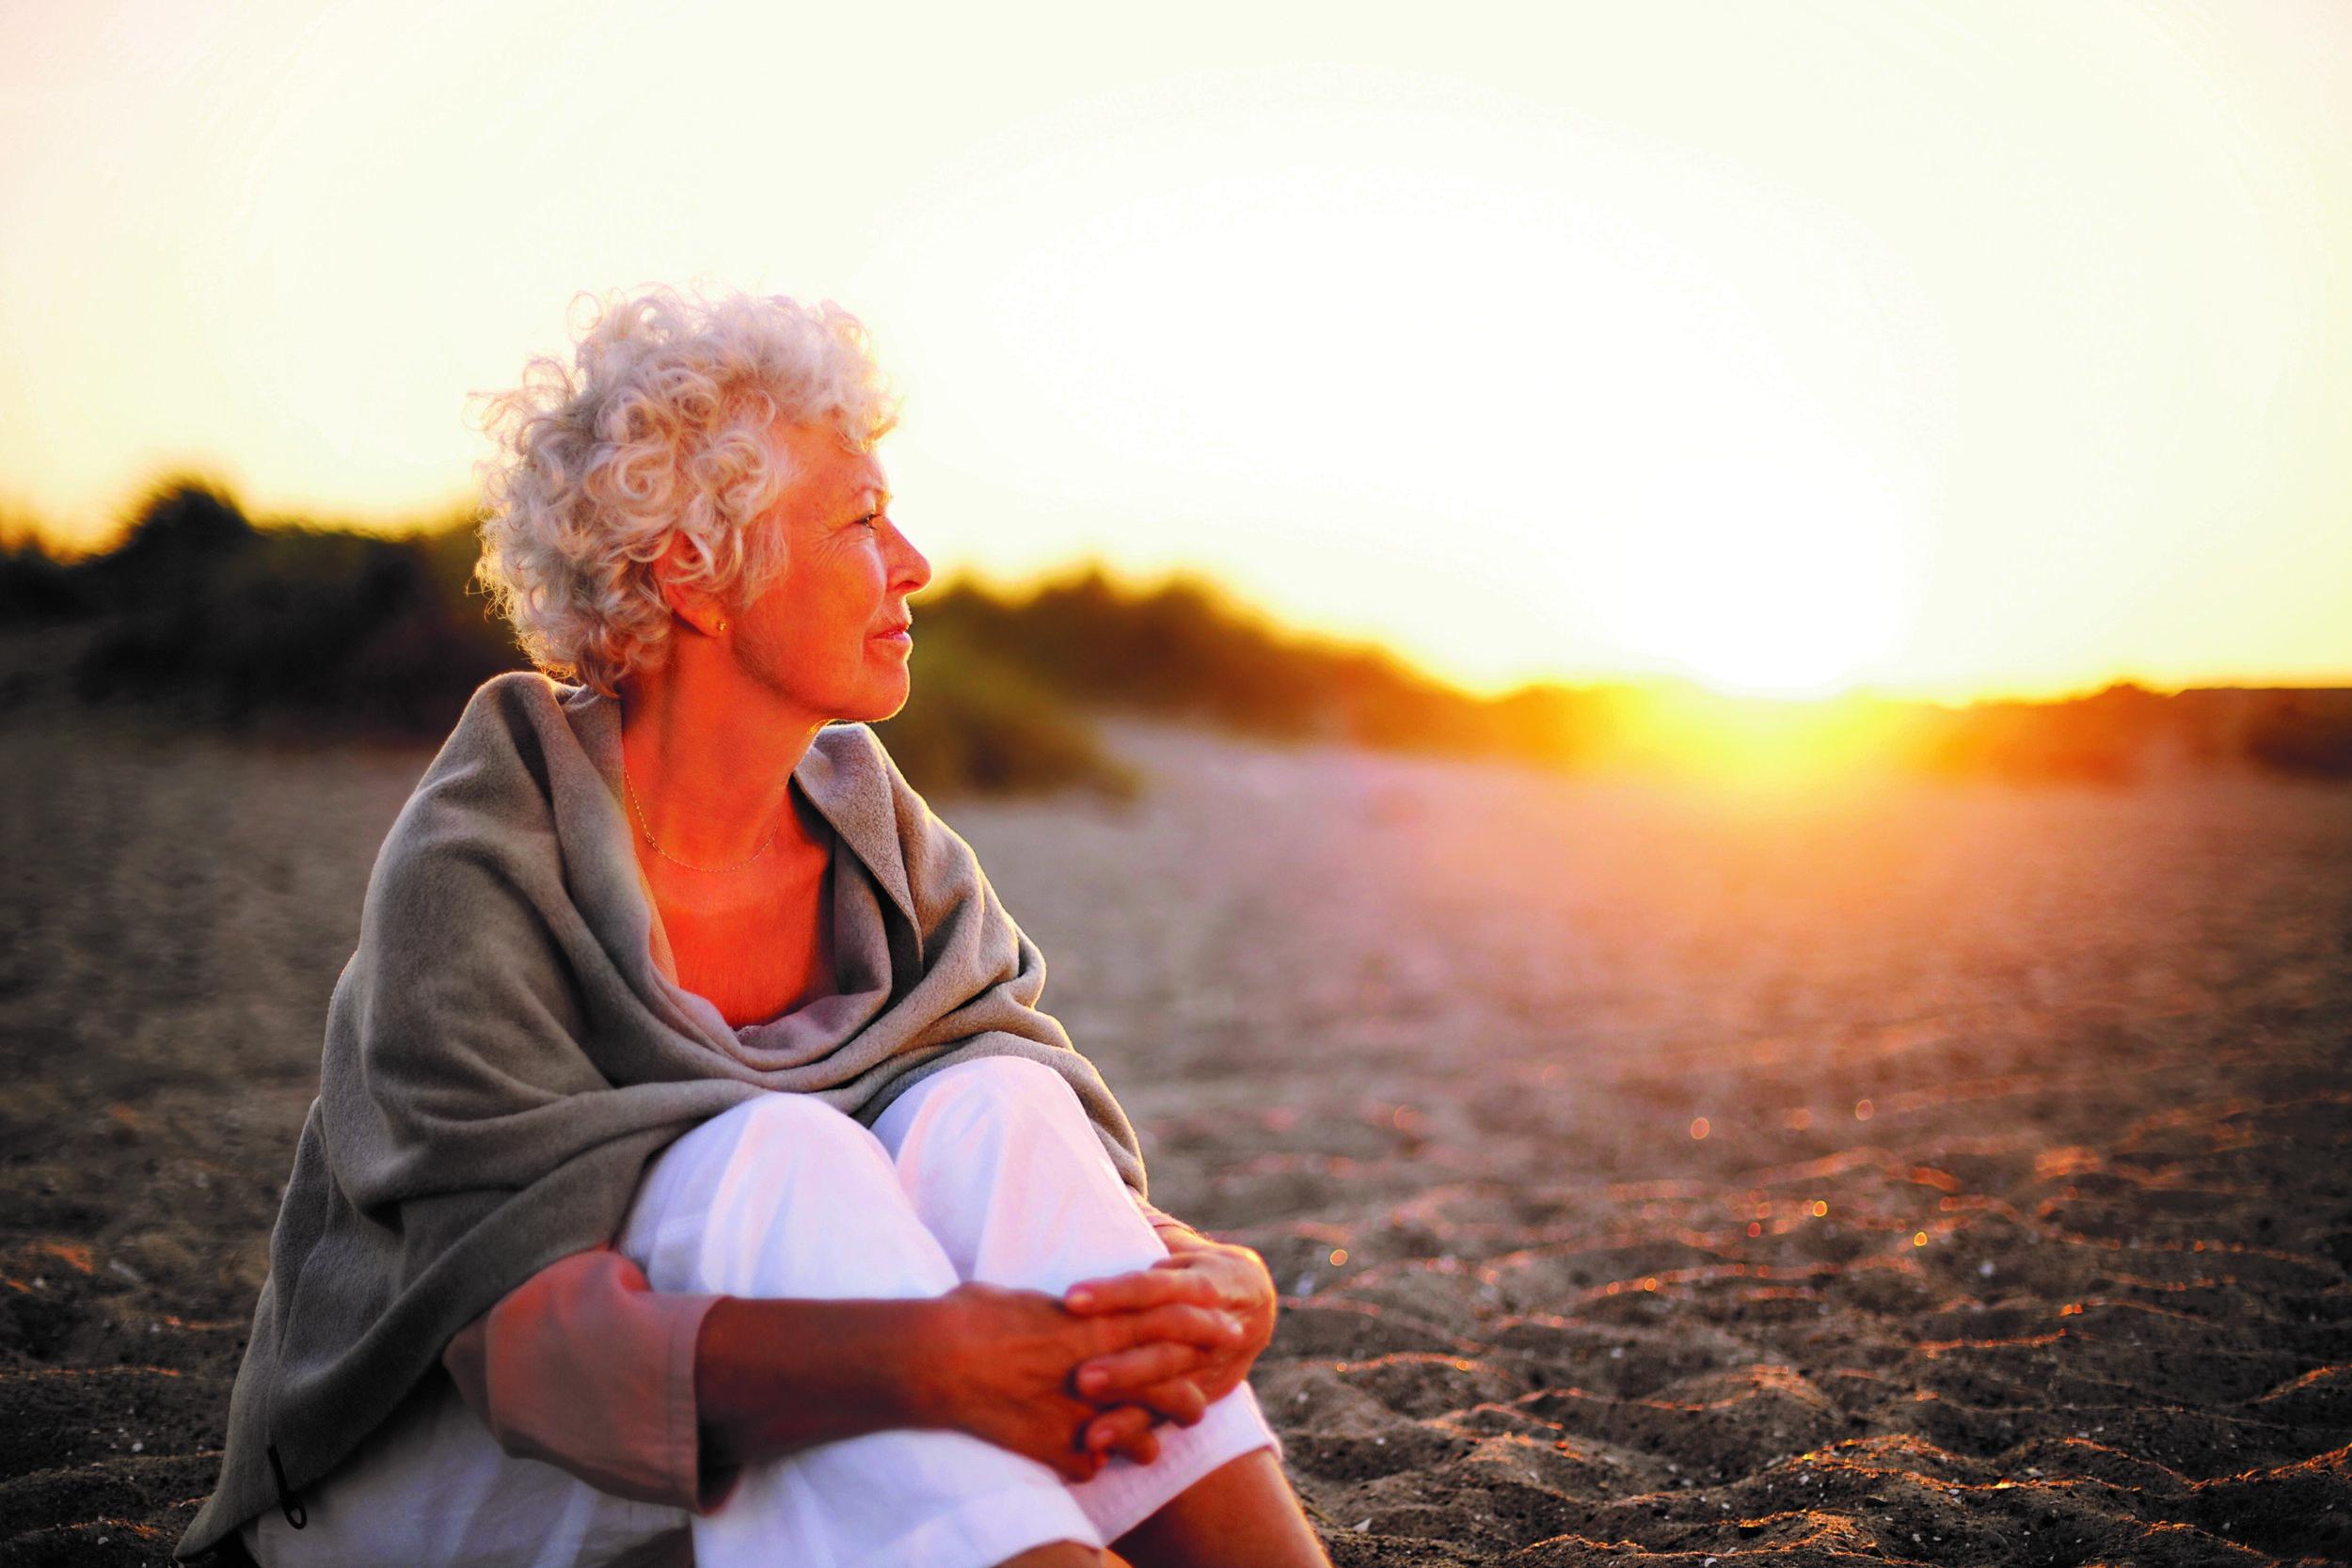 bigstock-Old-Woman-Sitting-On-The-Beach-62840824.jpg